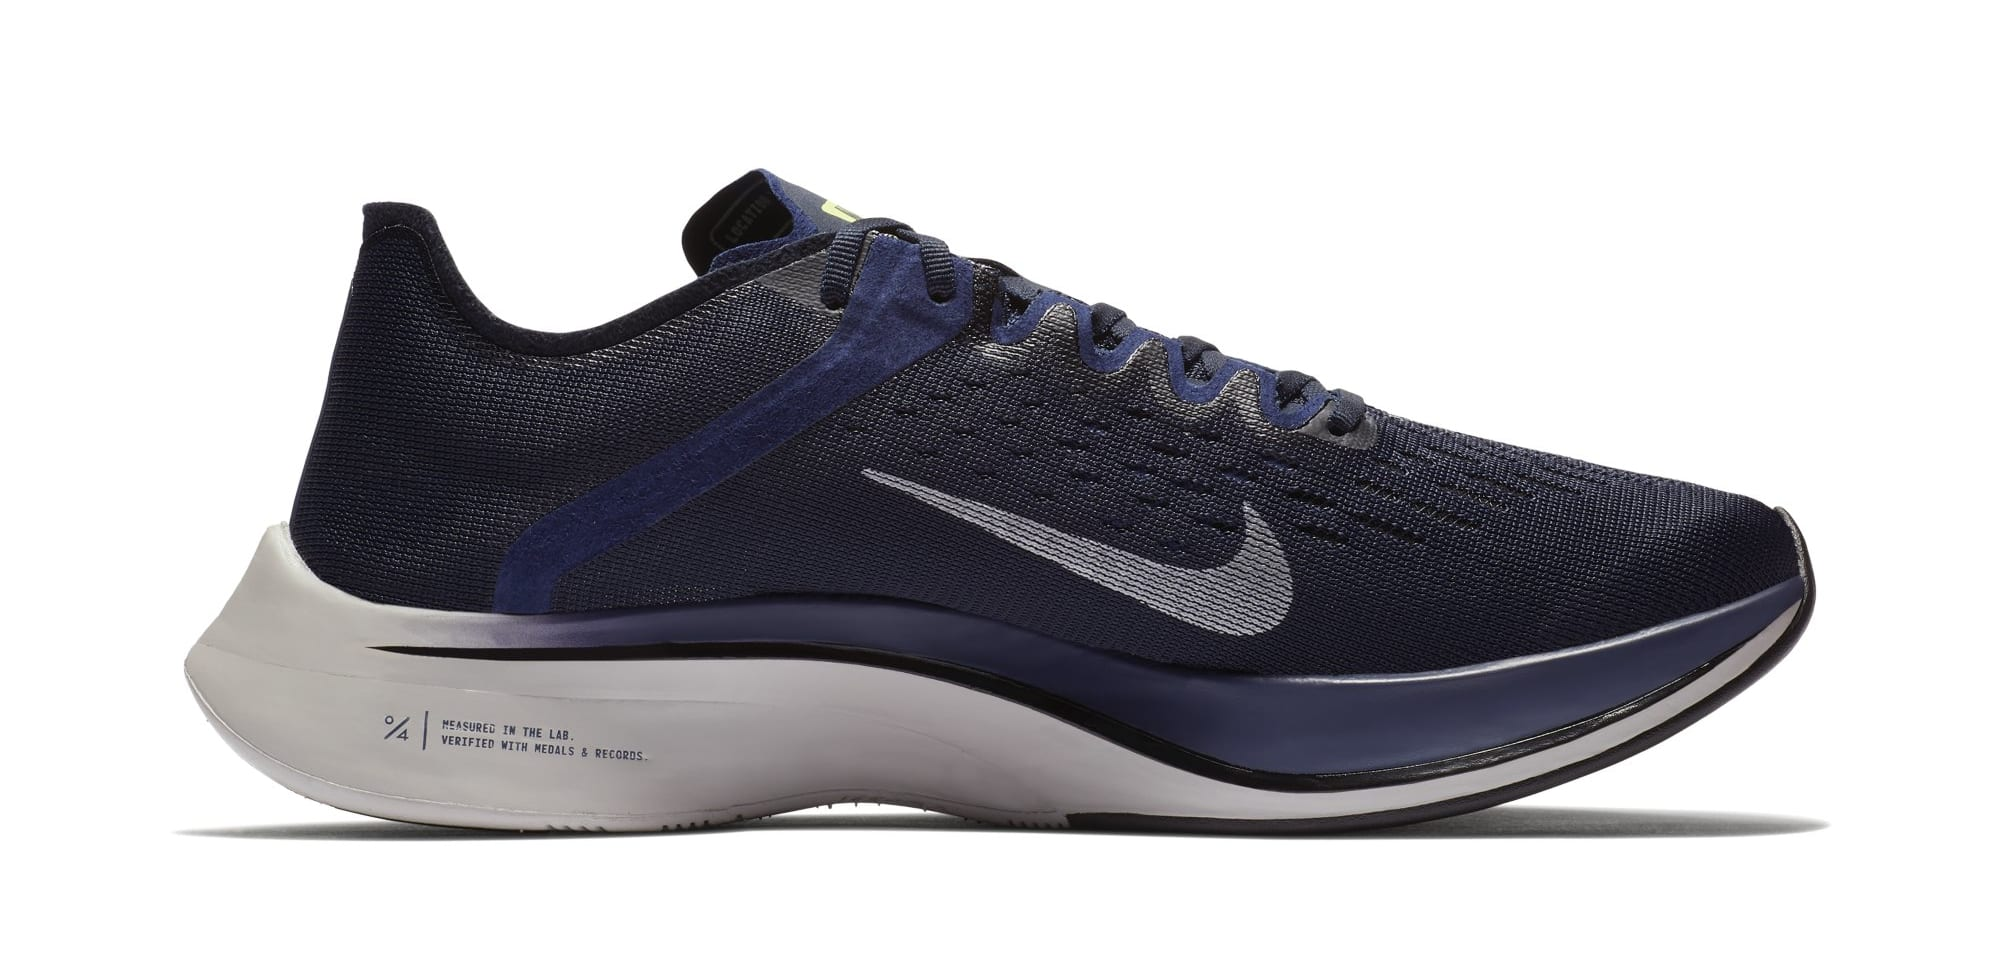 7eaa1cf8985c6a ... Image via Nike Nike Zoom Vaporfly 4% Obsidian 880847-405 (Medial) ...